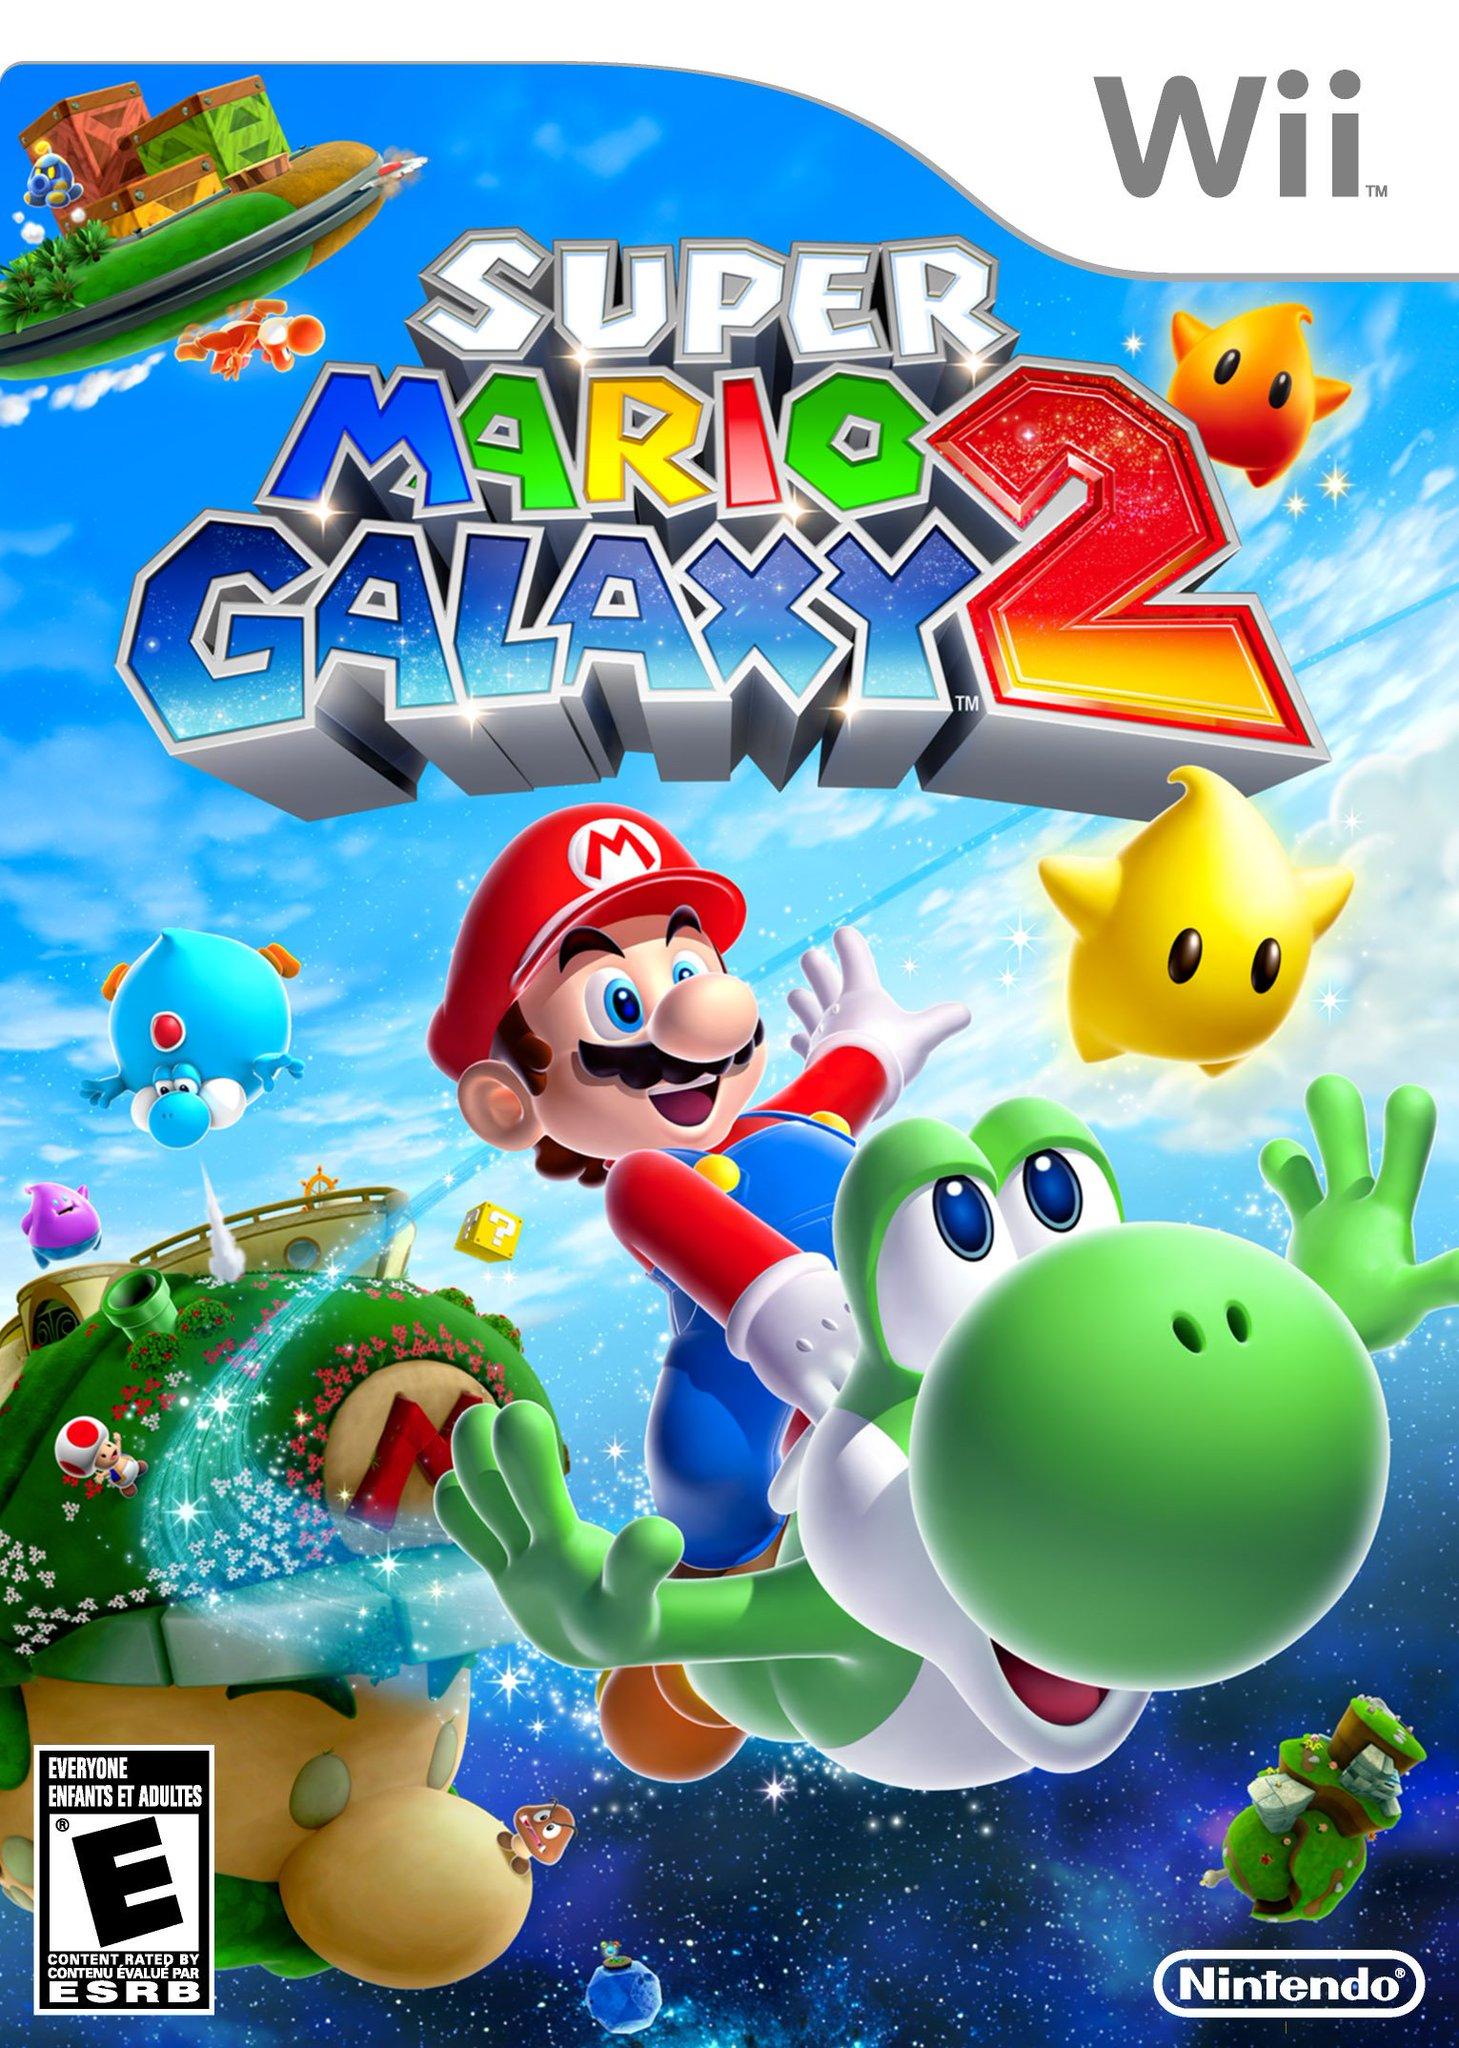 Super Mario Galaxy 2 for the Nintendo Wii https://t.co/wIJ2O3jG2U